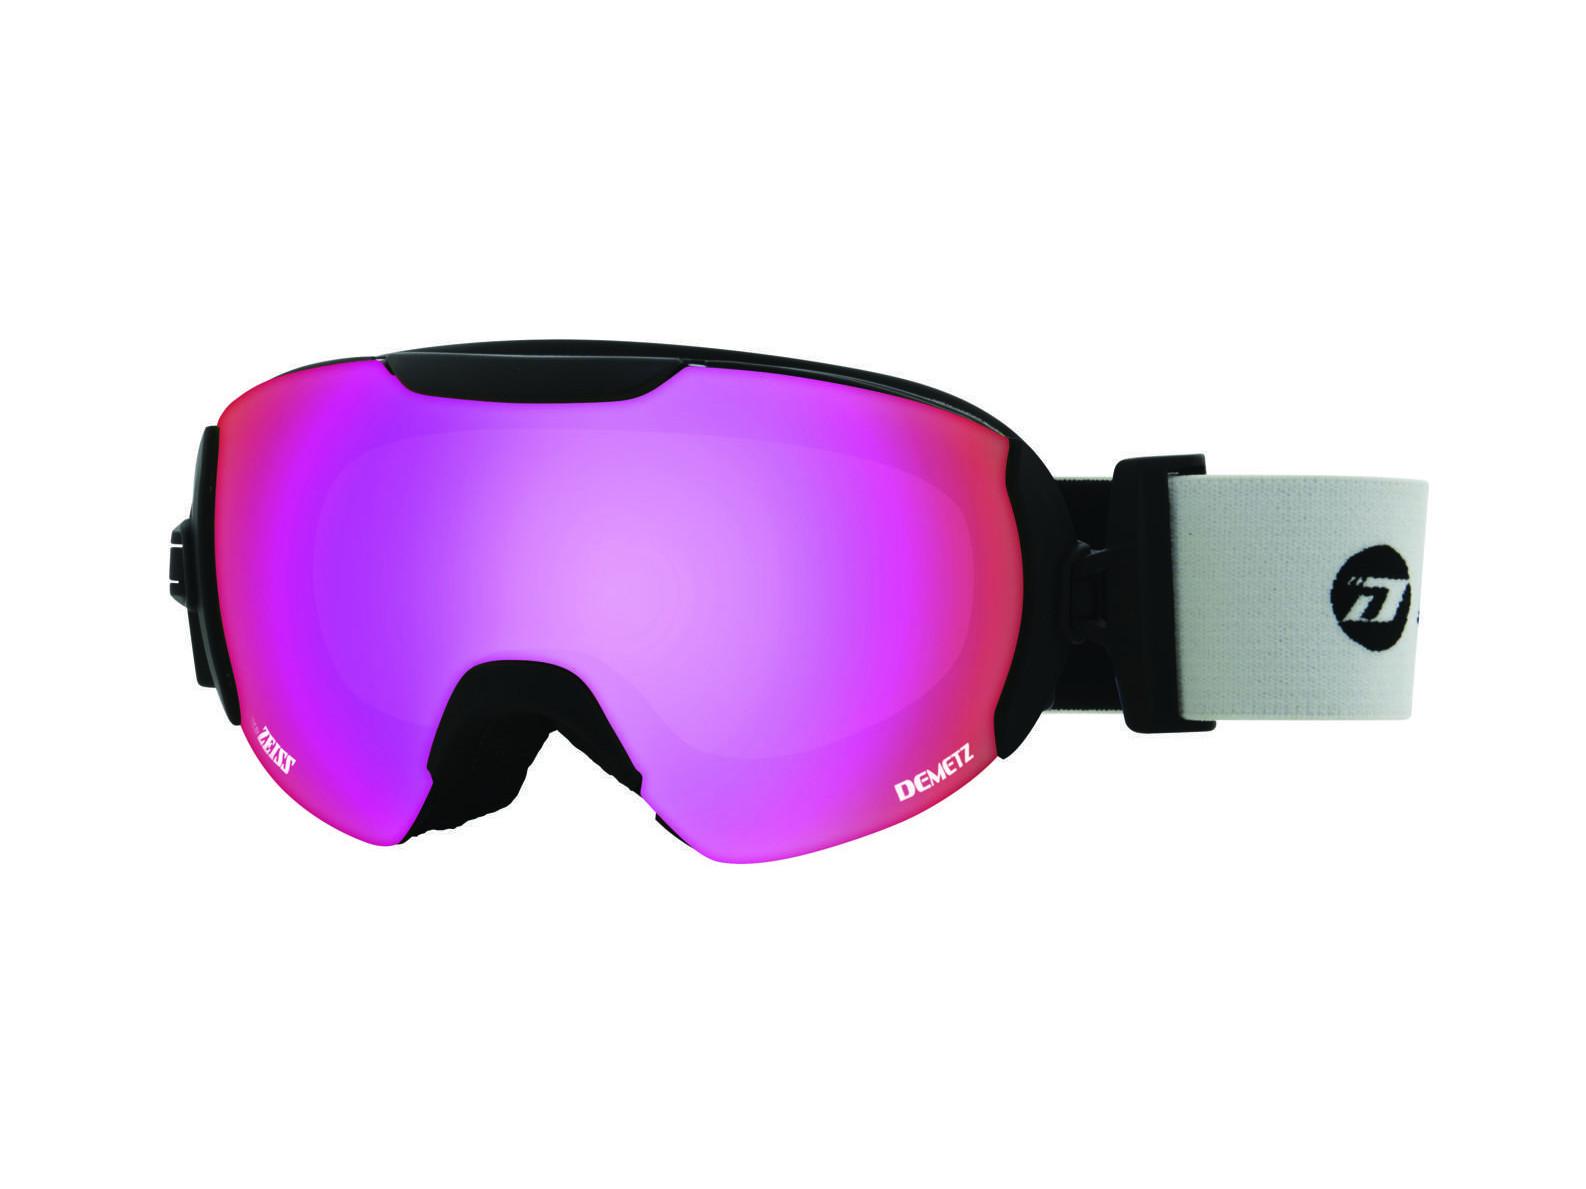 Masque de ski pour femme DEMETZ Noir Mat POW Noir Mat cat 3 ee26d1861370